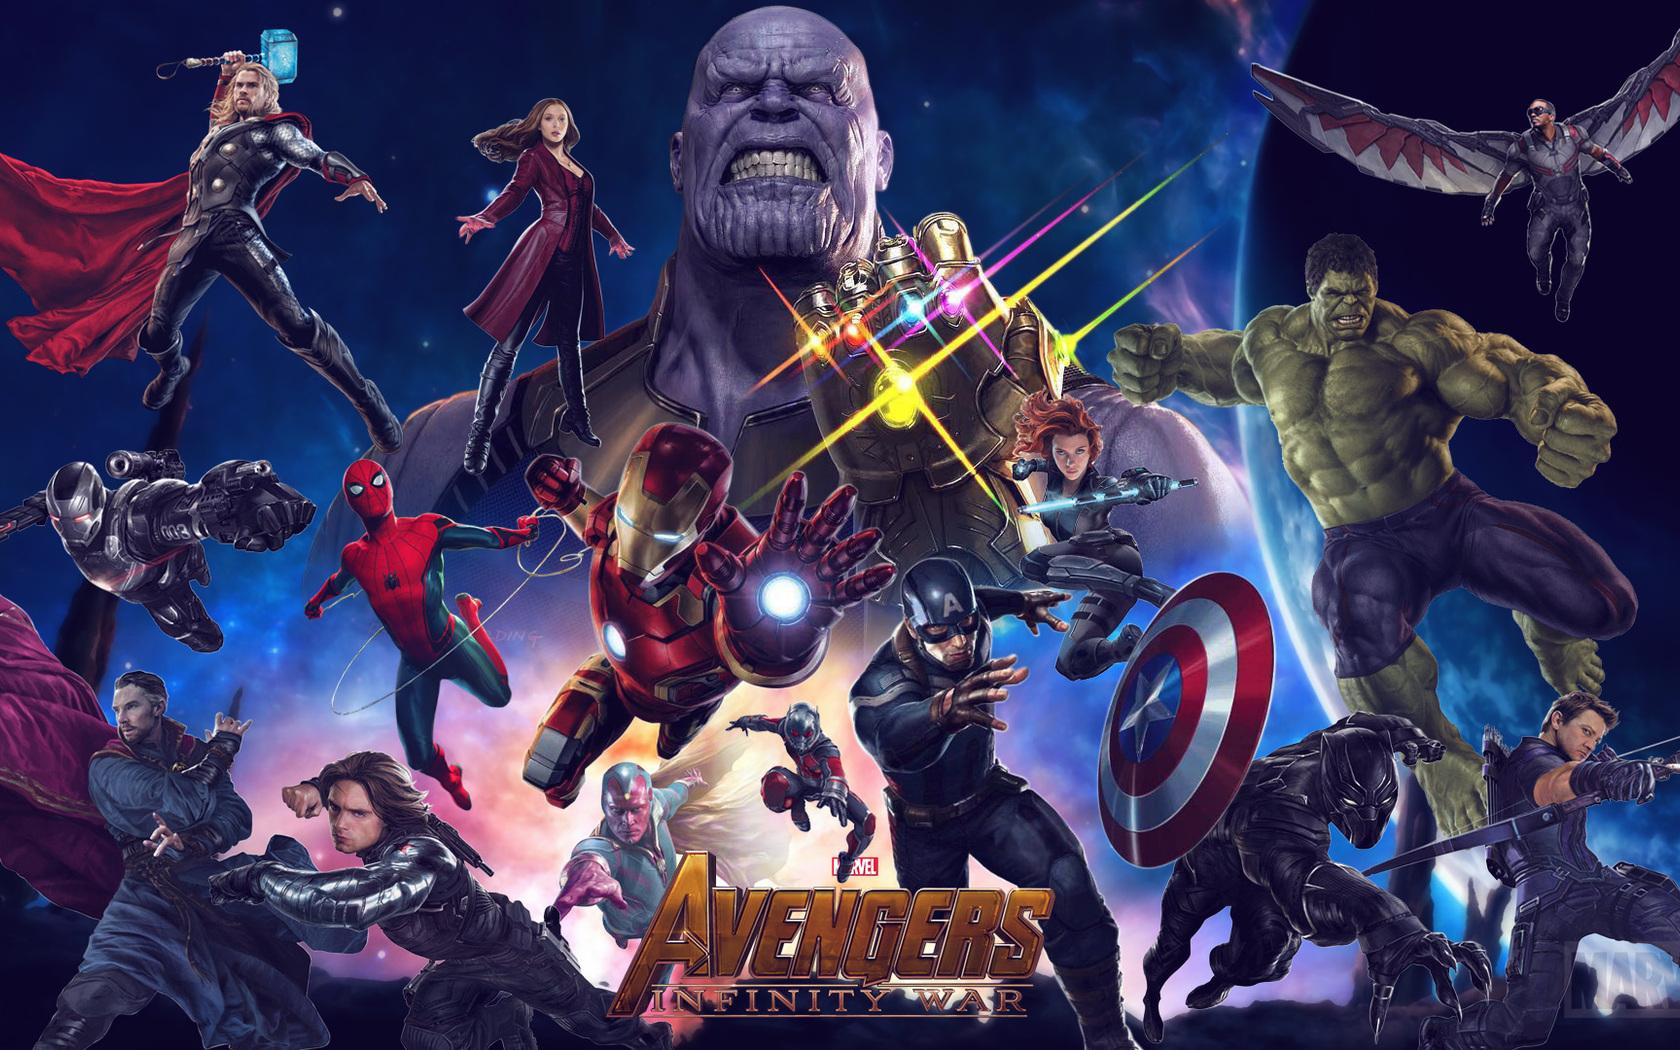 1680x1050 Avengers Infinity War 2018 Movie 1680x1050